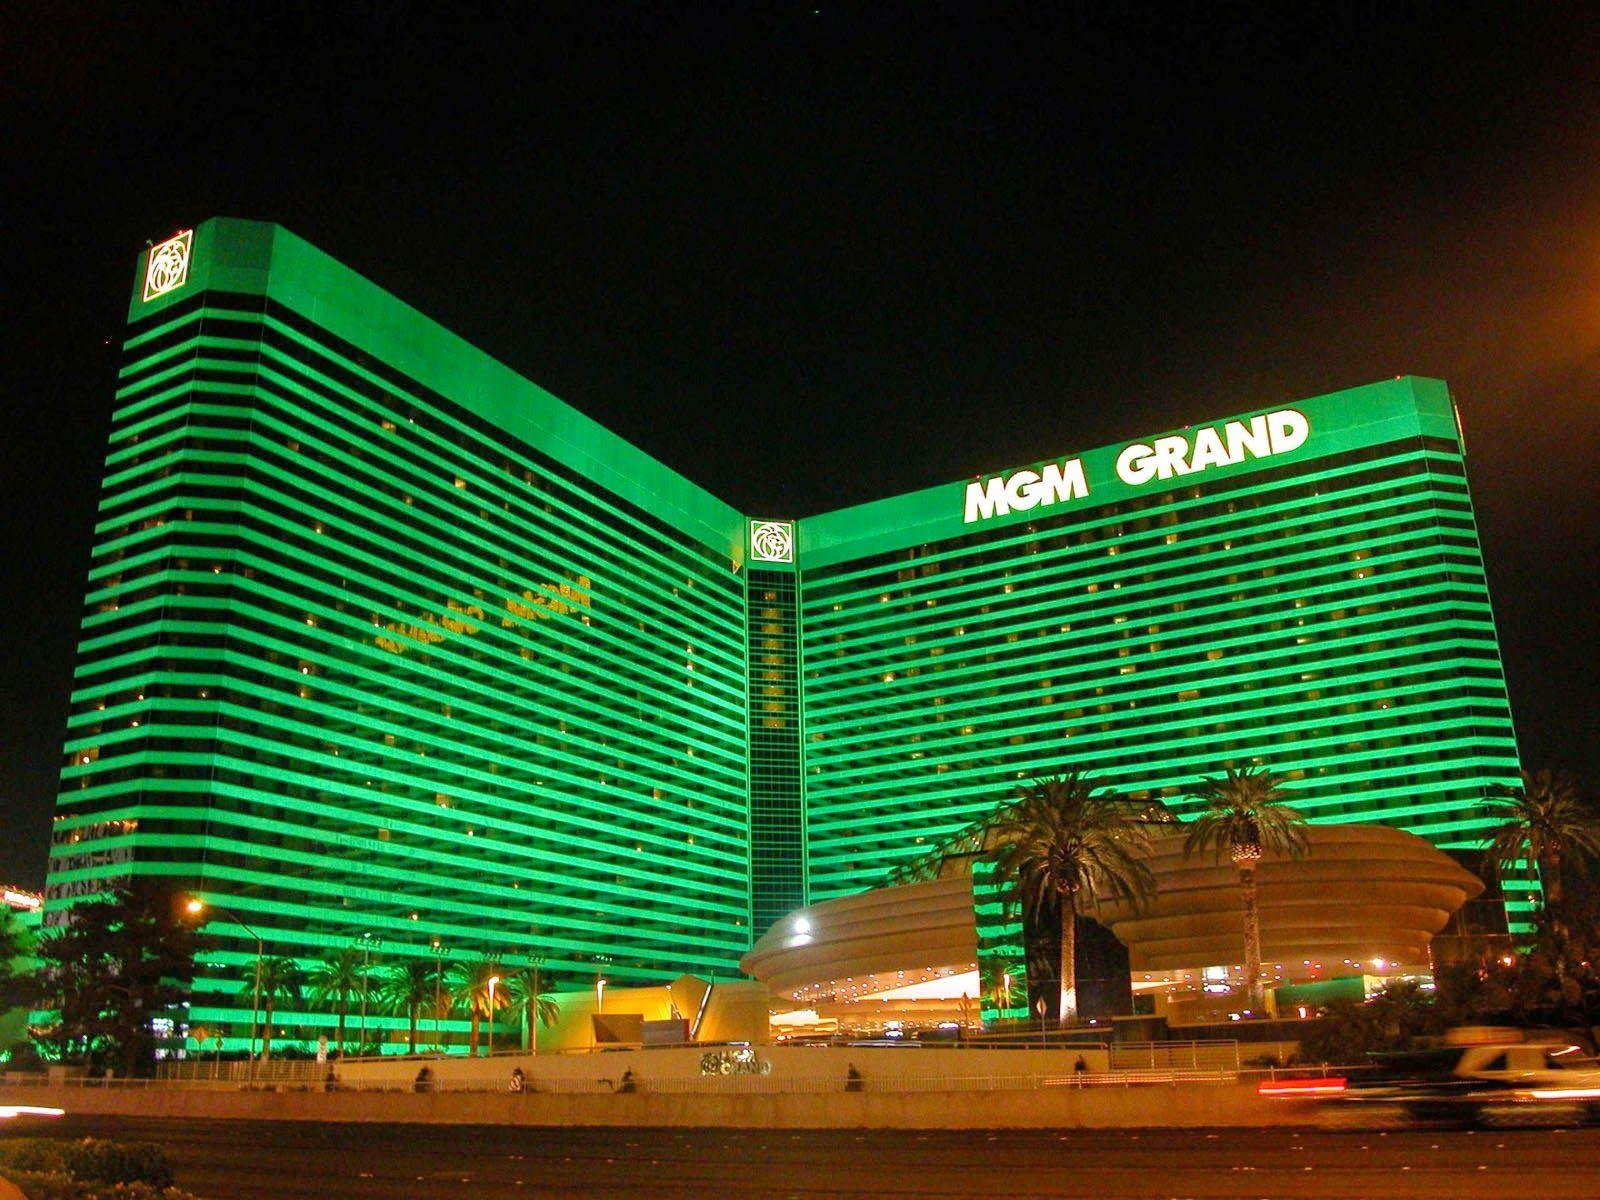 Mgm Grand Las Vegas- Tyson Dined Holyfield